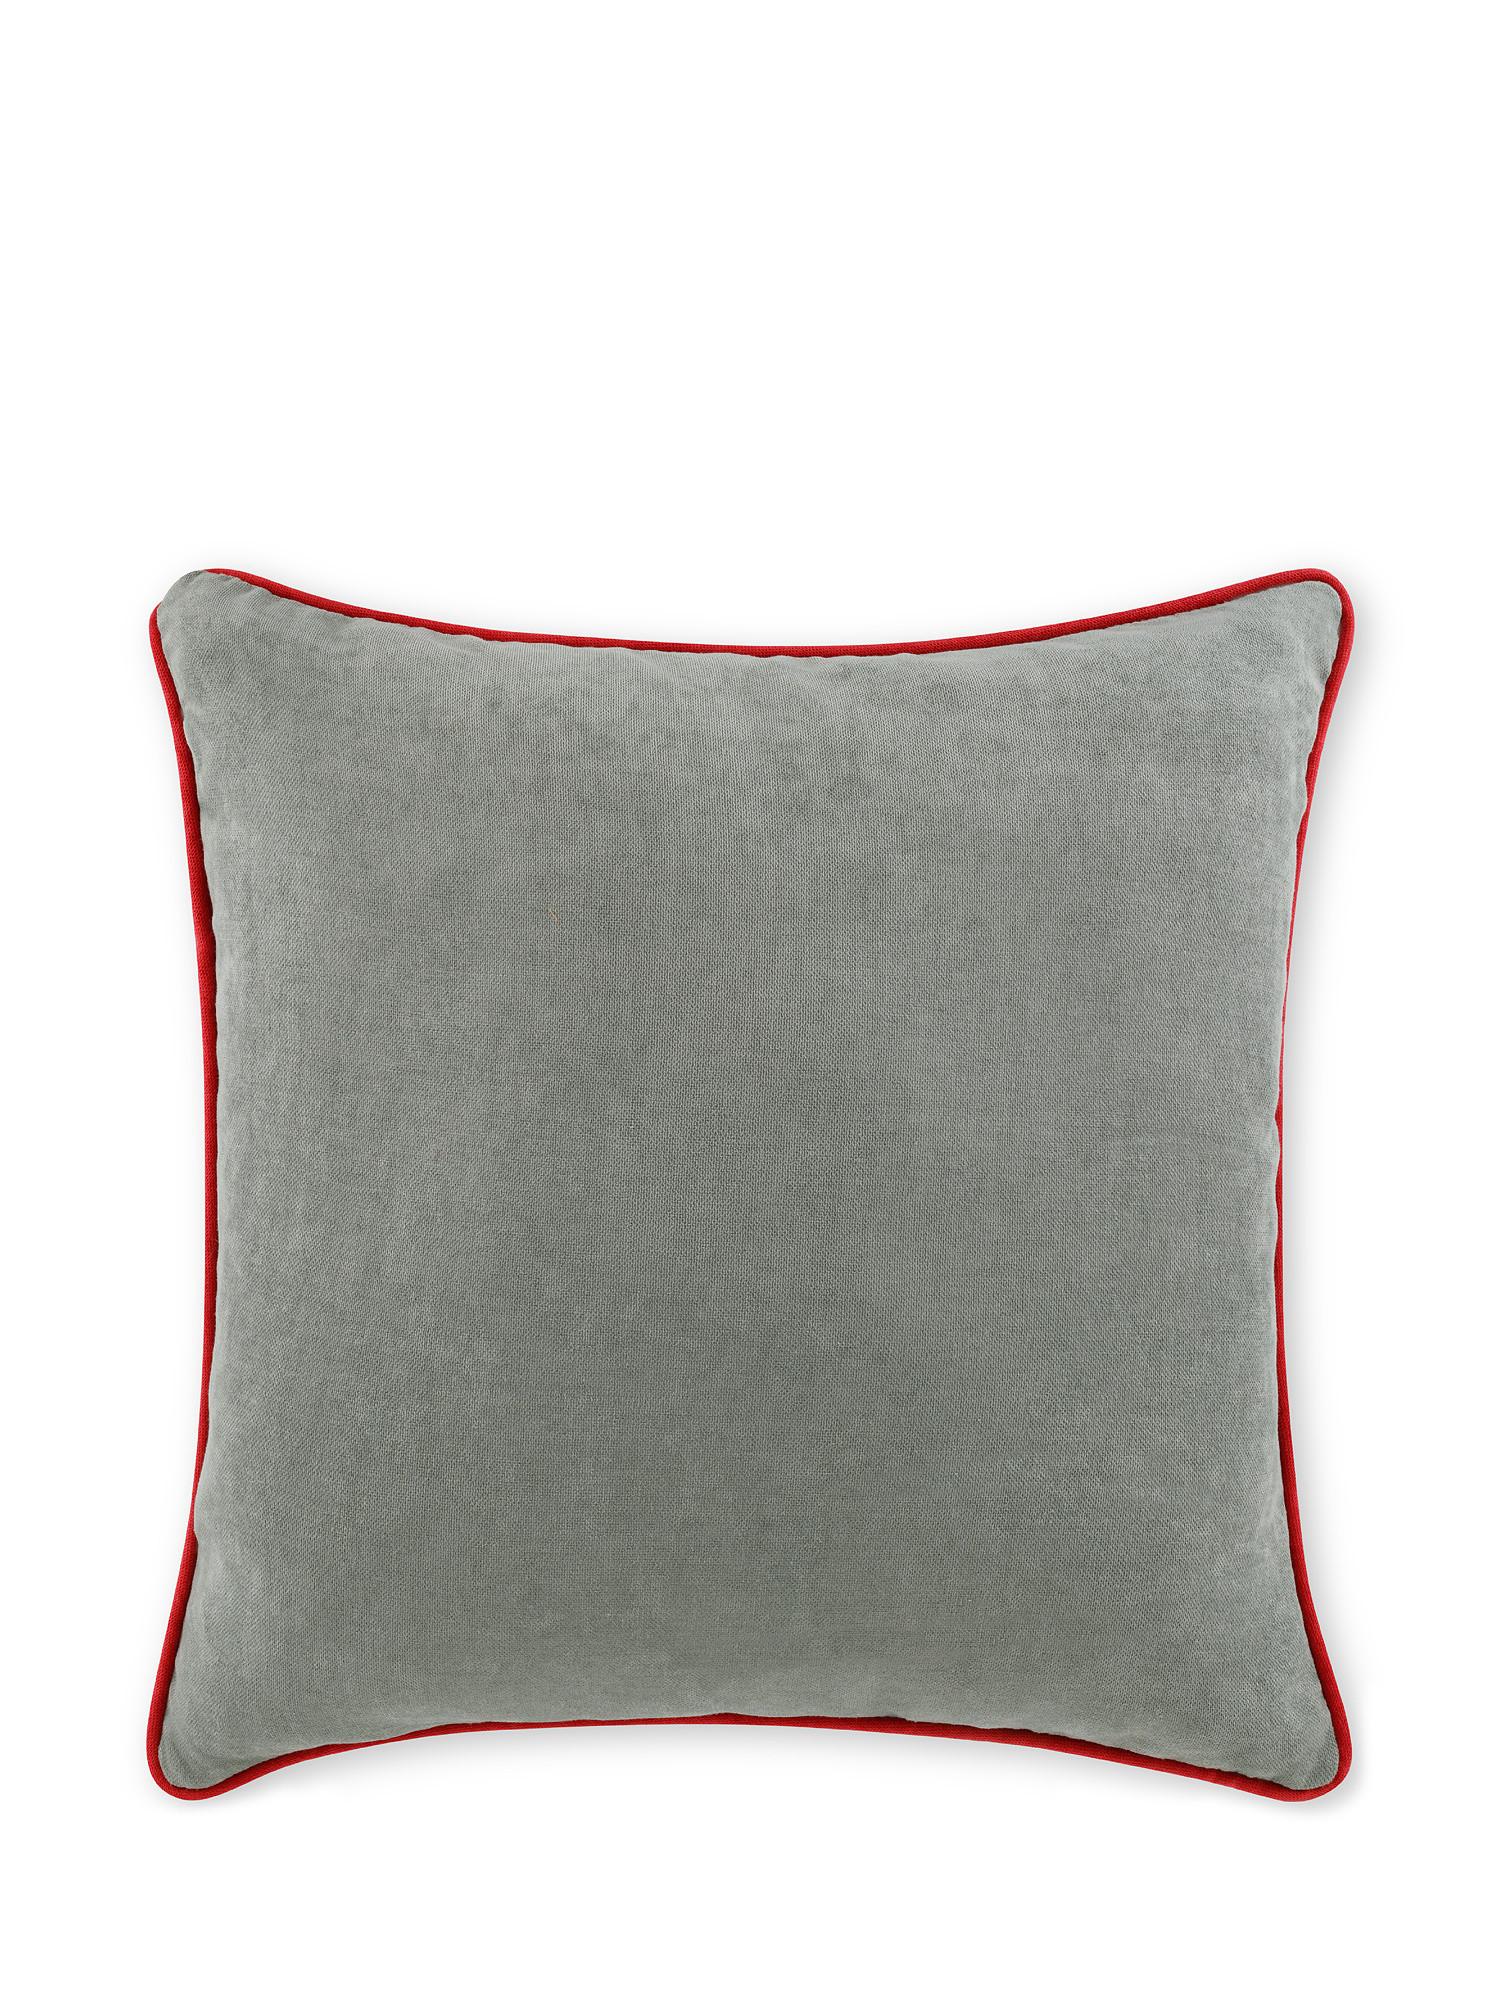 Cuscino tessuto effetto mélange 50x50cm, Grigio, large image number 1